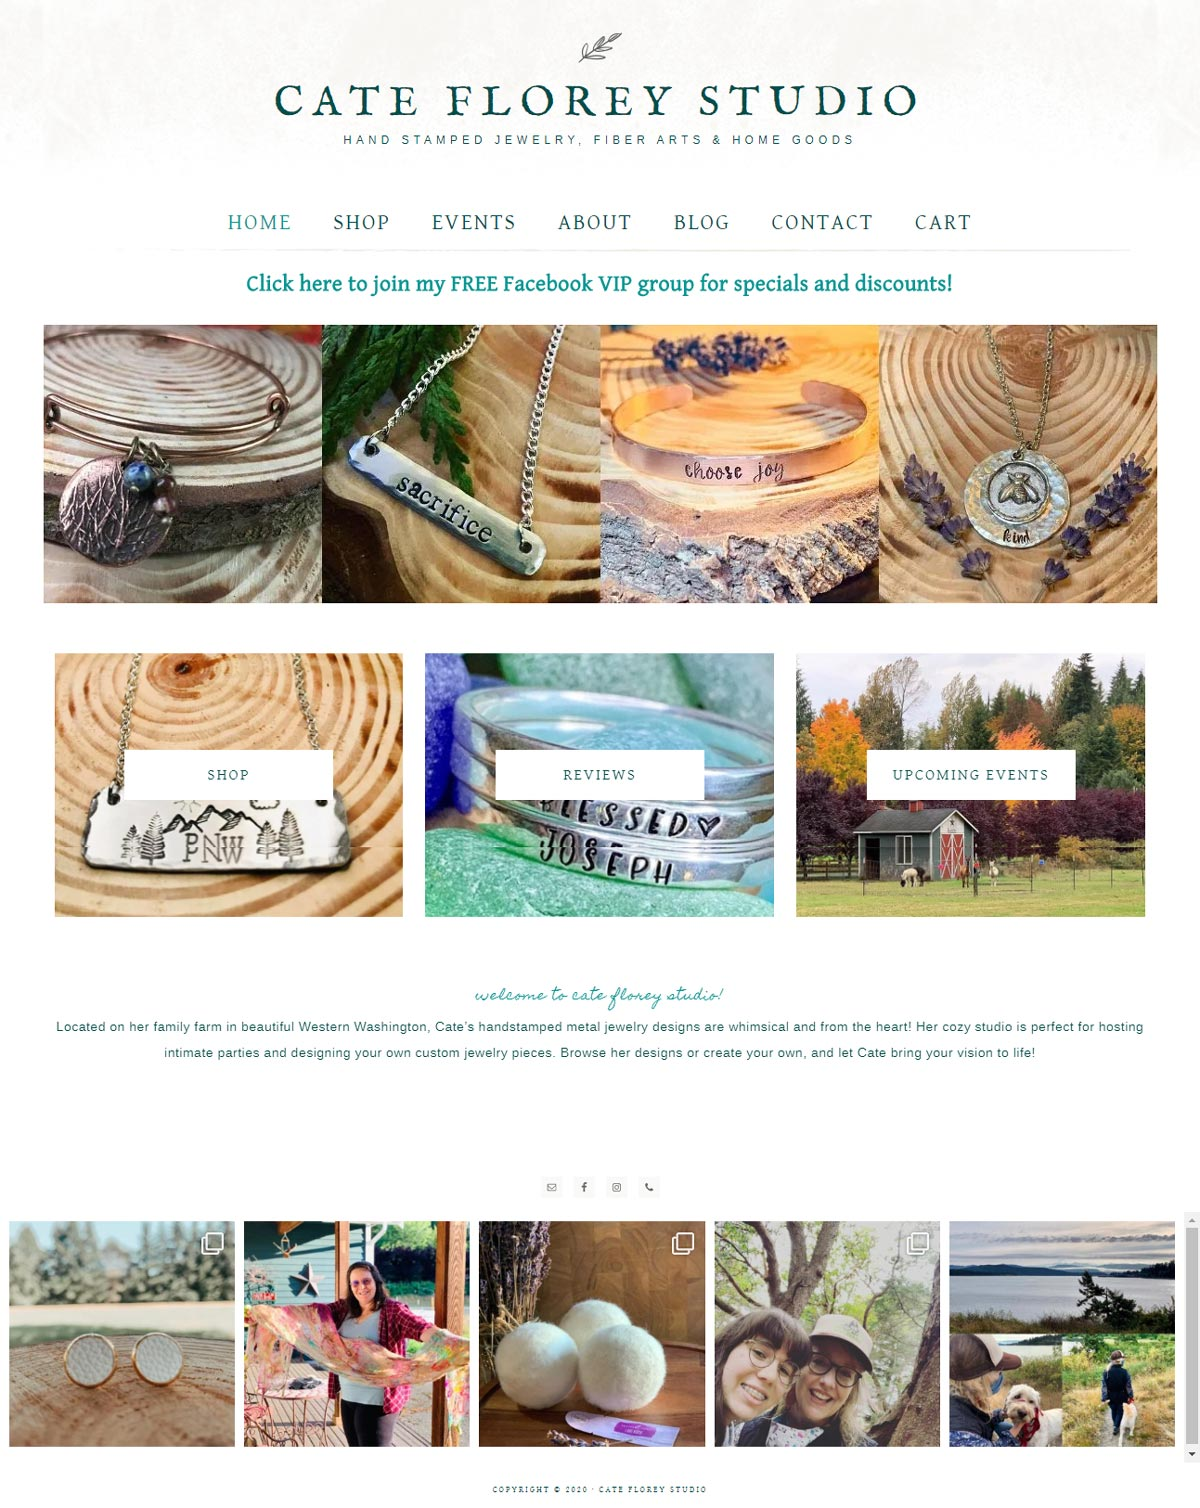 cate florey studio website homepage